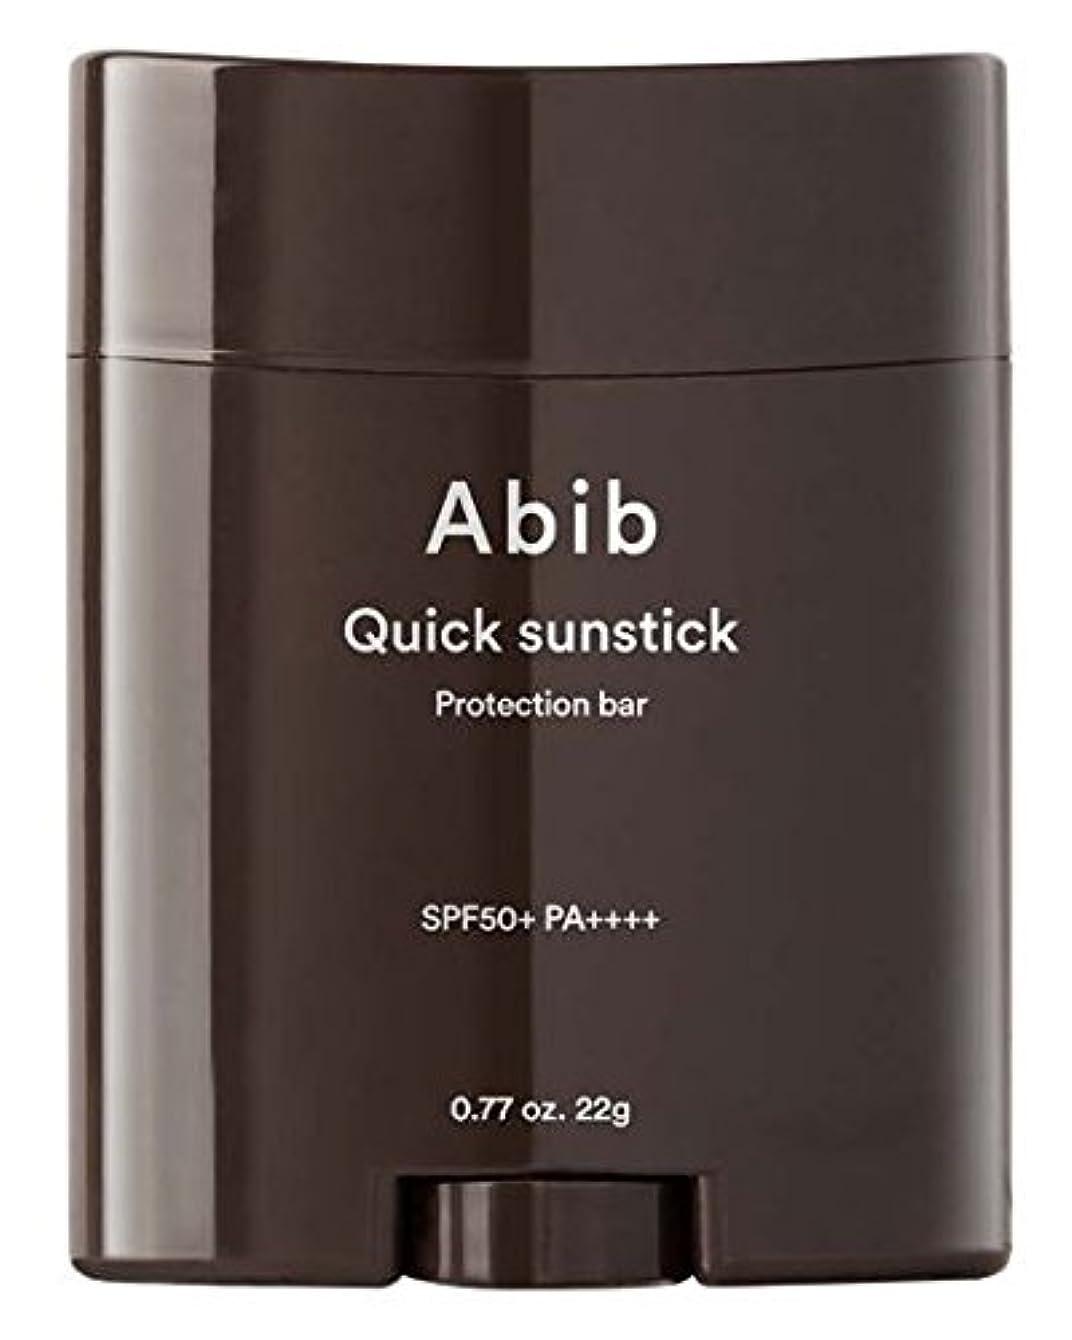 [Abib] QUICK SUNSTICK PROTECTION BAR 22g SPF50+PA++++/[アビブ]クイックサンスティックプロテクションバー 22g SPF50+PA++++ [並行輸入品]